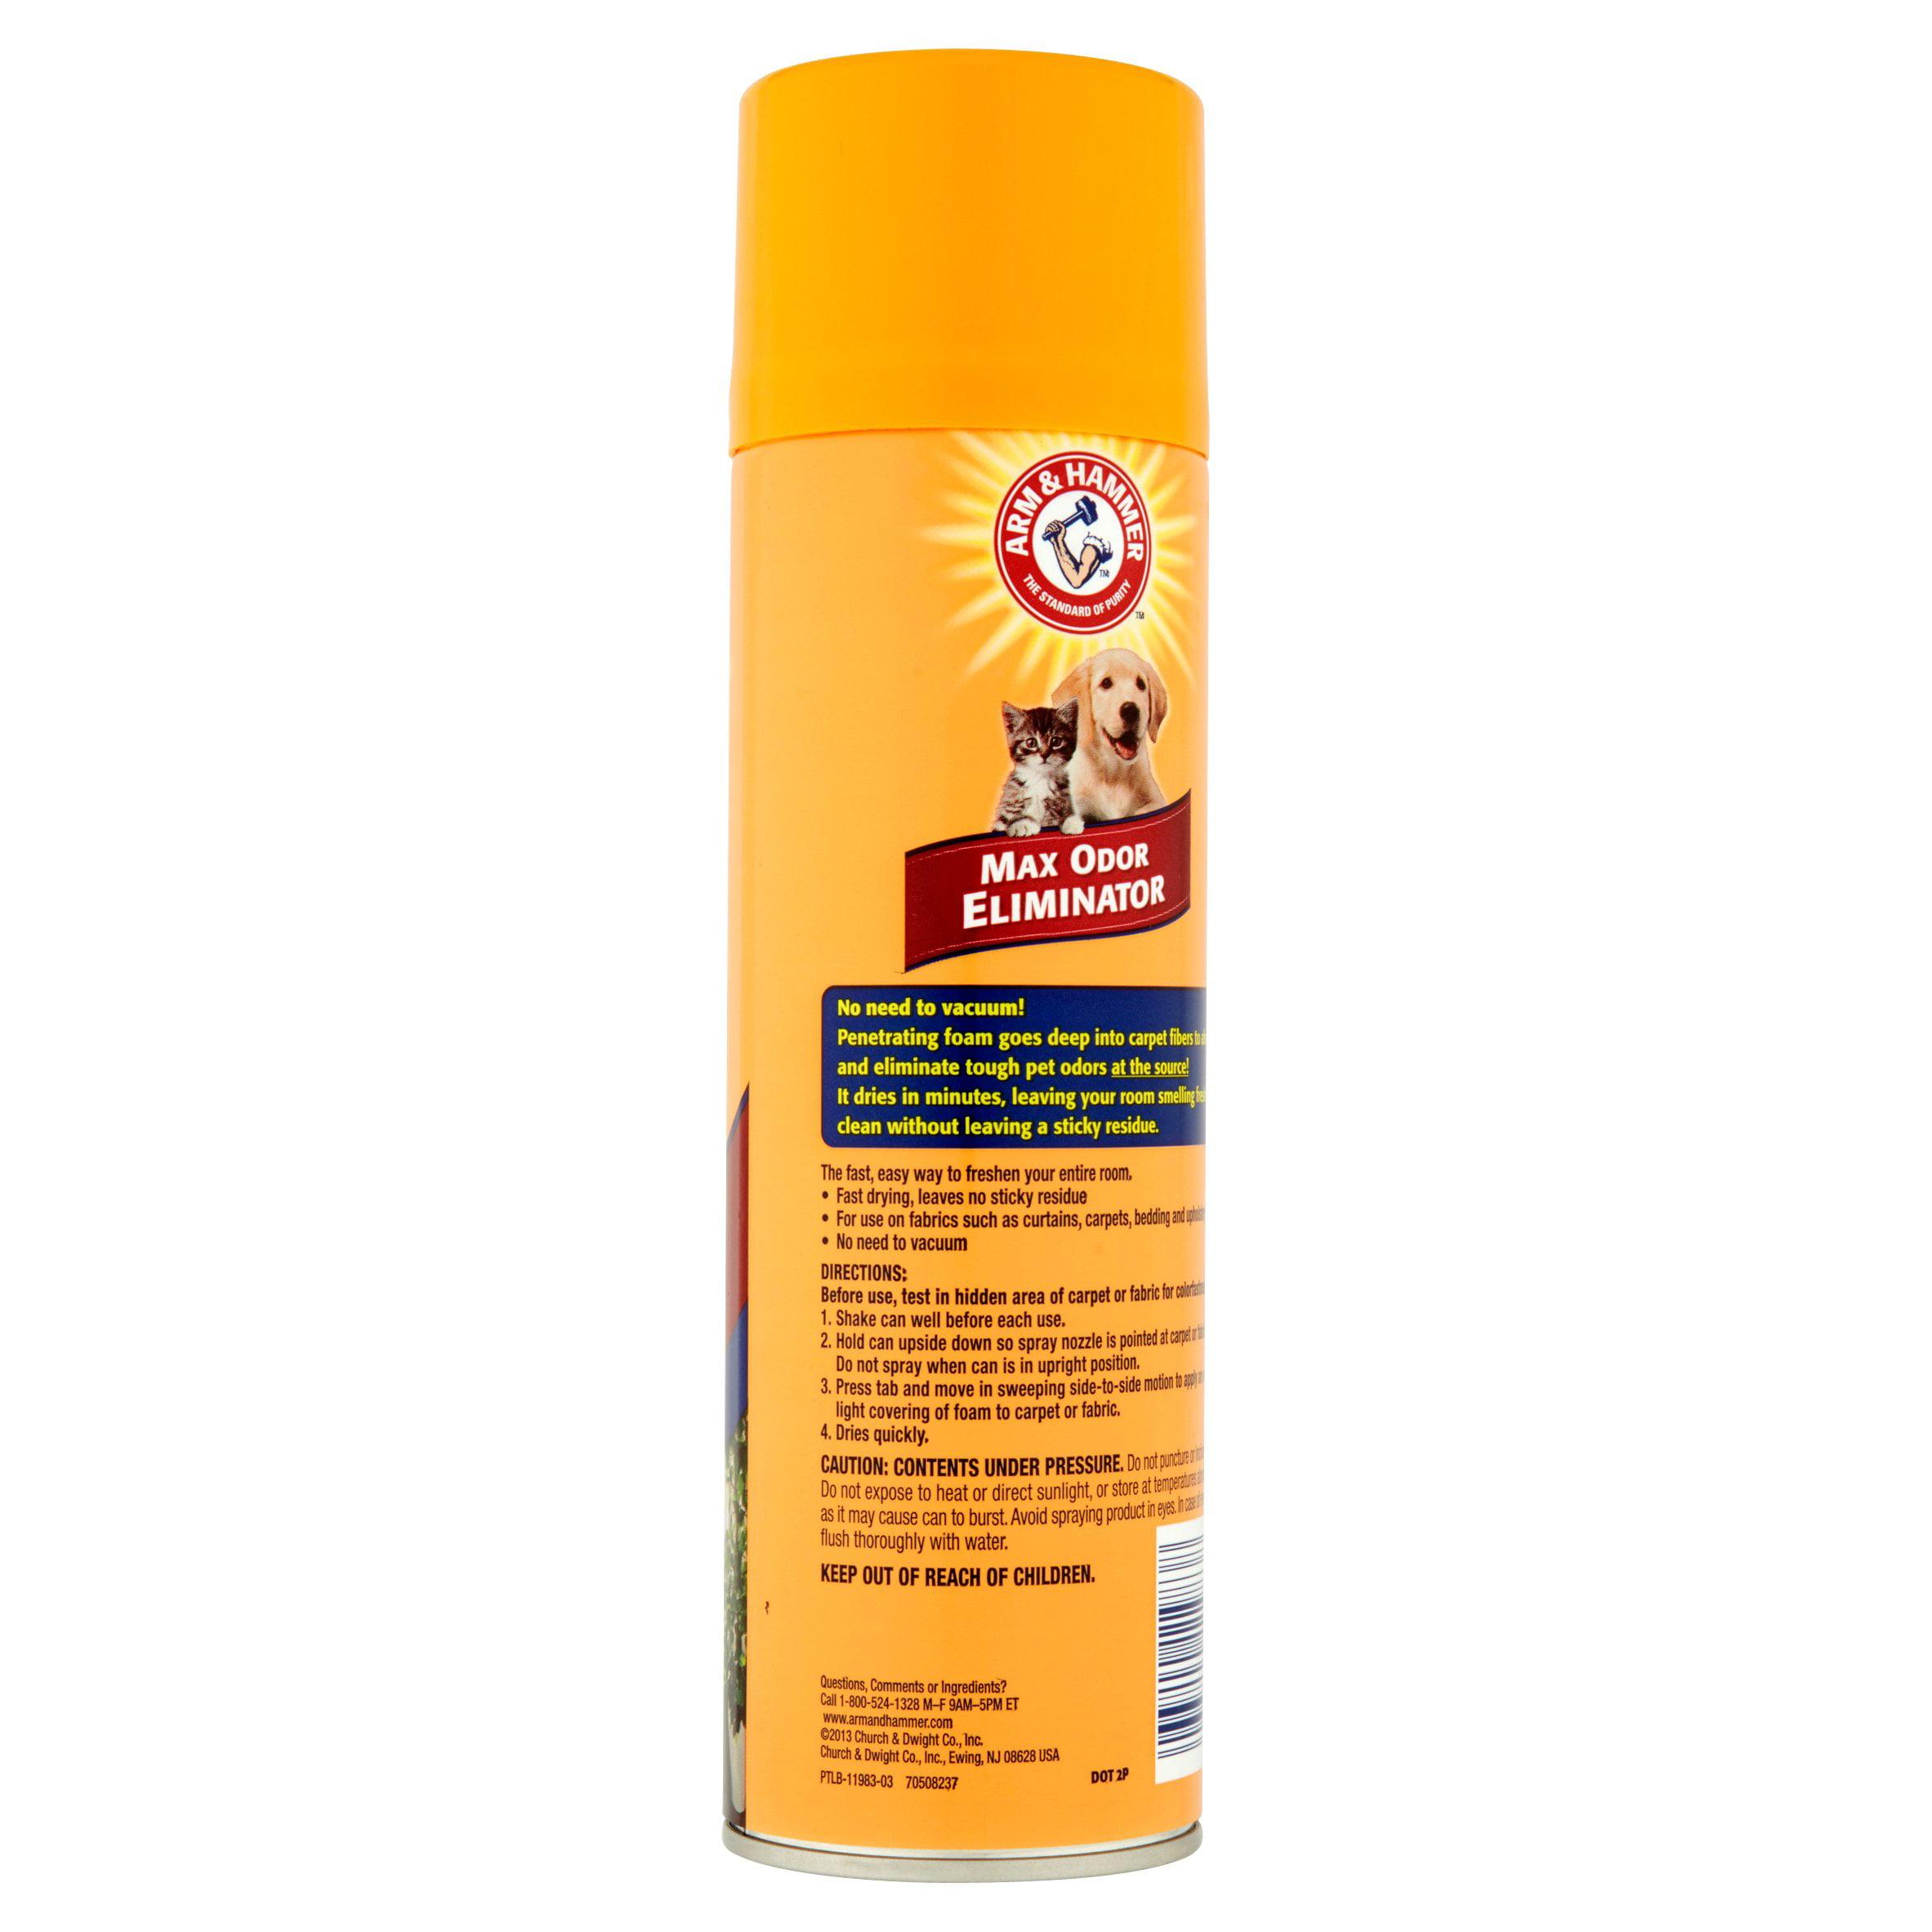 Arm & Hammer Max Odor Eliminator, Vacuum Free Foam for Carpet & Upholstery, 15 Oz. - Walmart.com